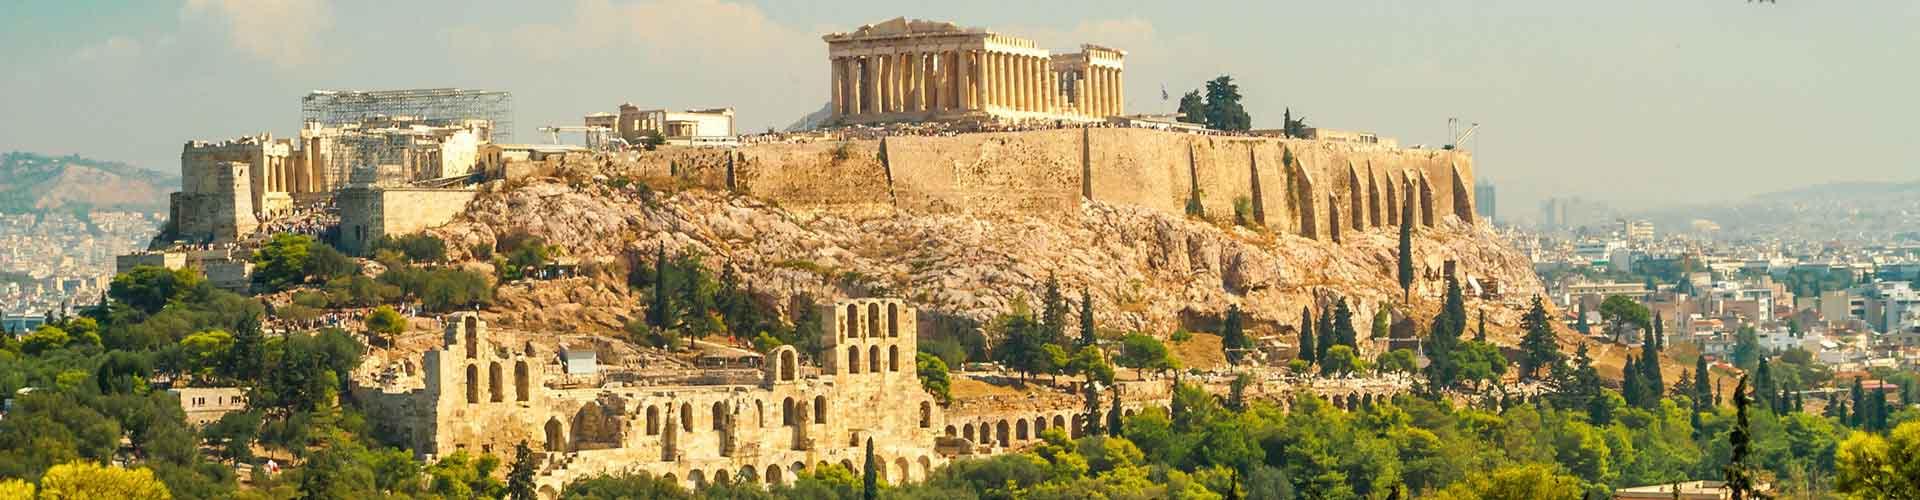 Atenas – Camping em Atenas. Mapas para Atenas, Fotos e Avaliações para cada camping em Atenas.